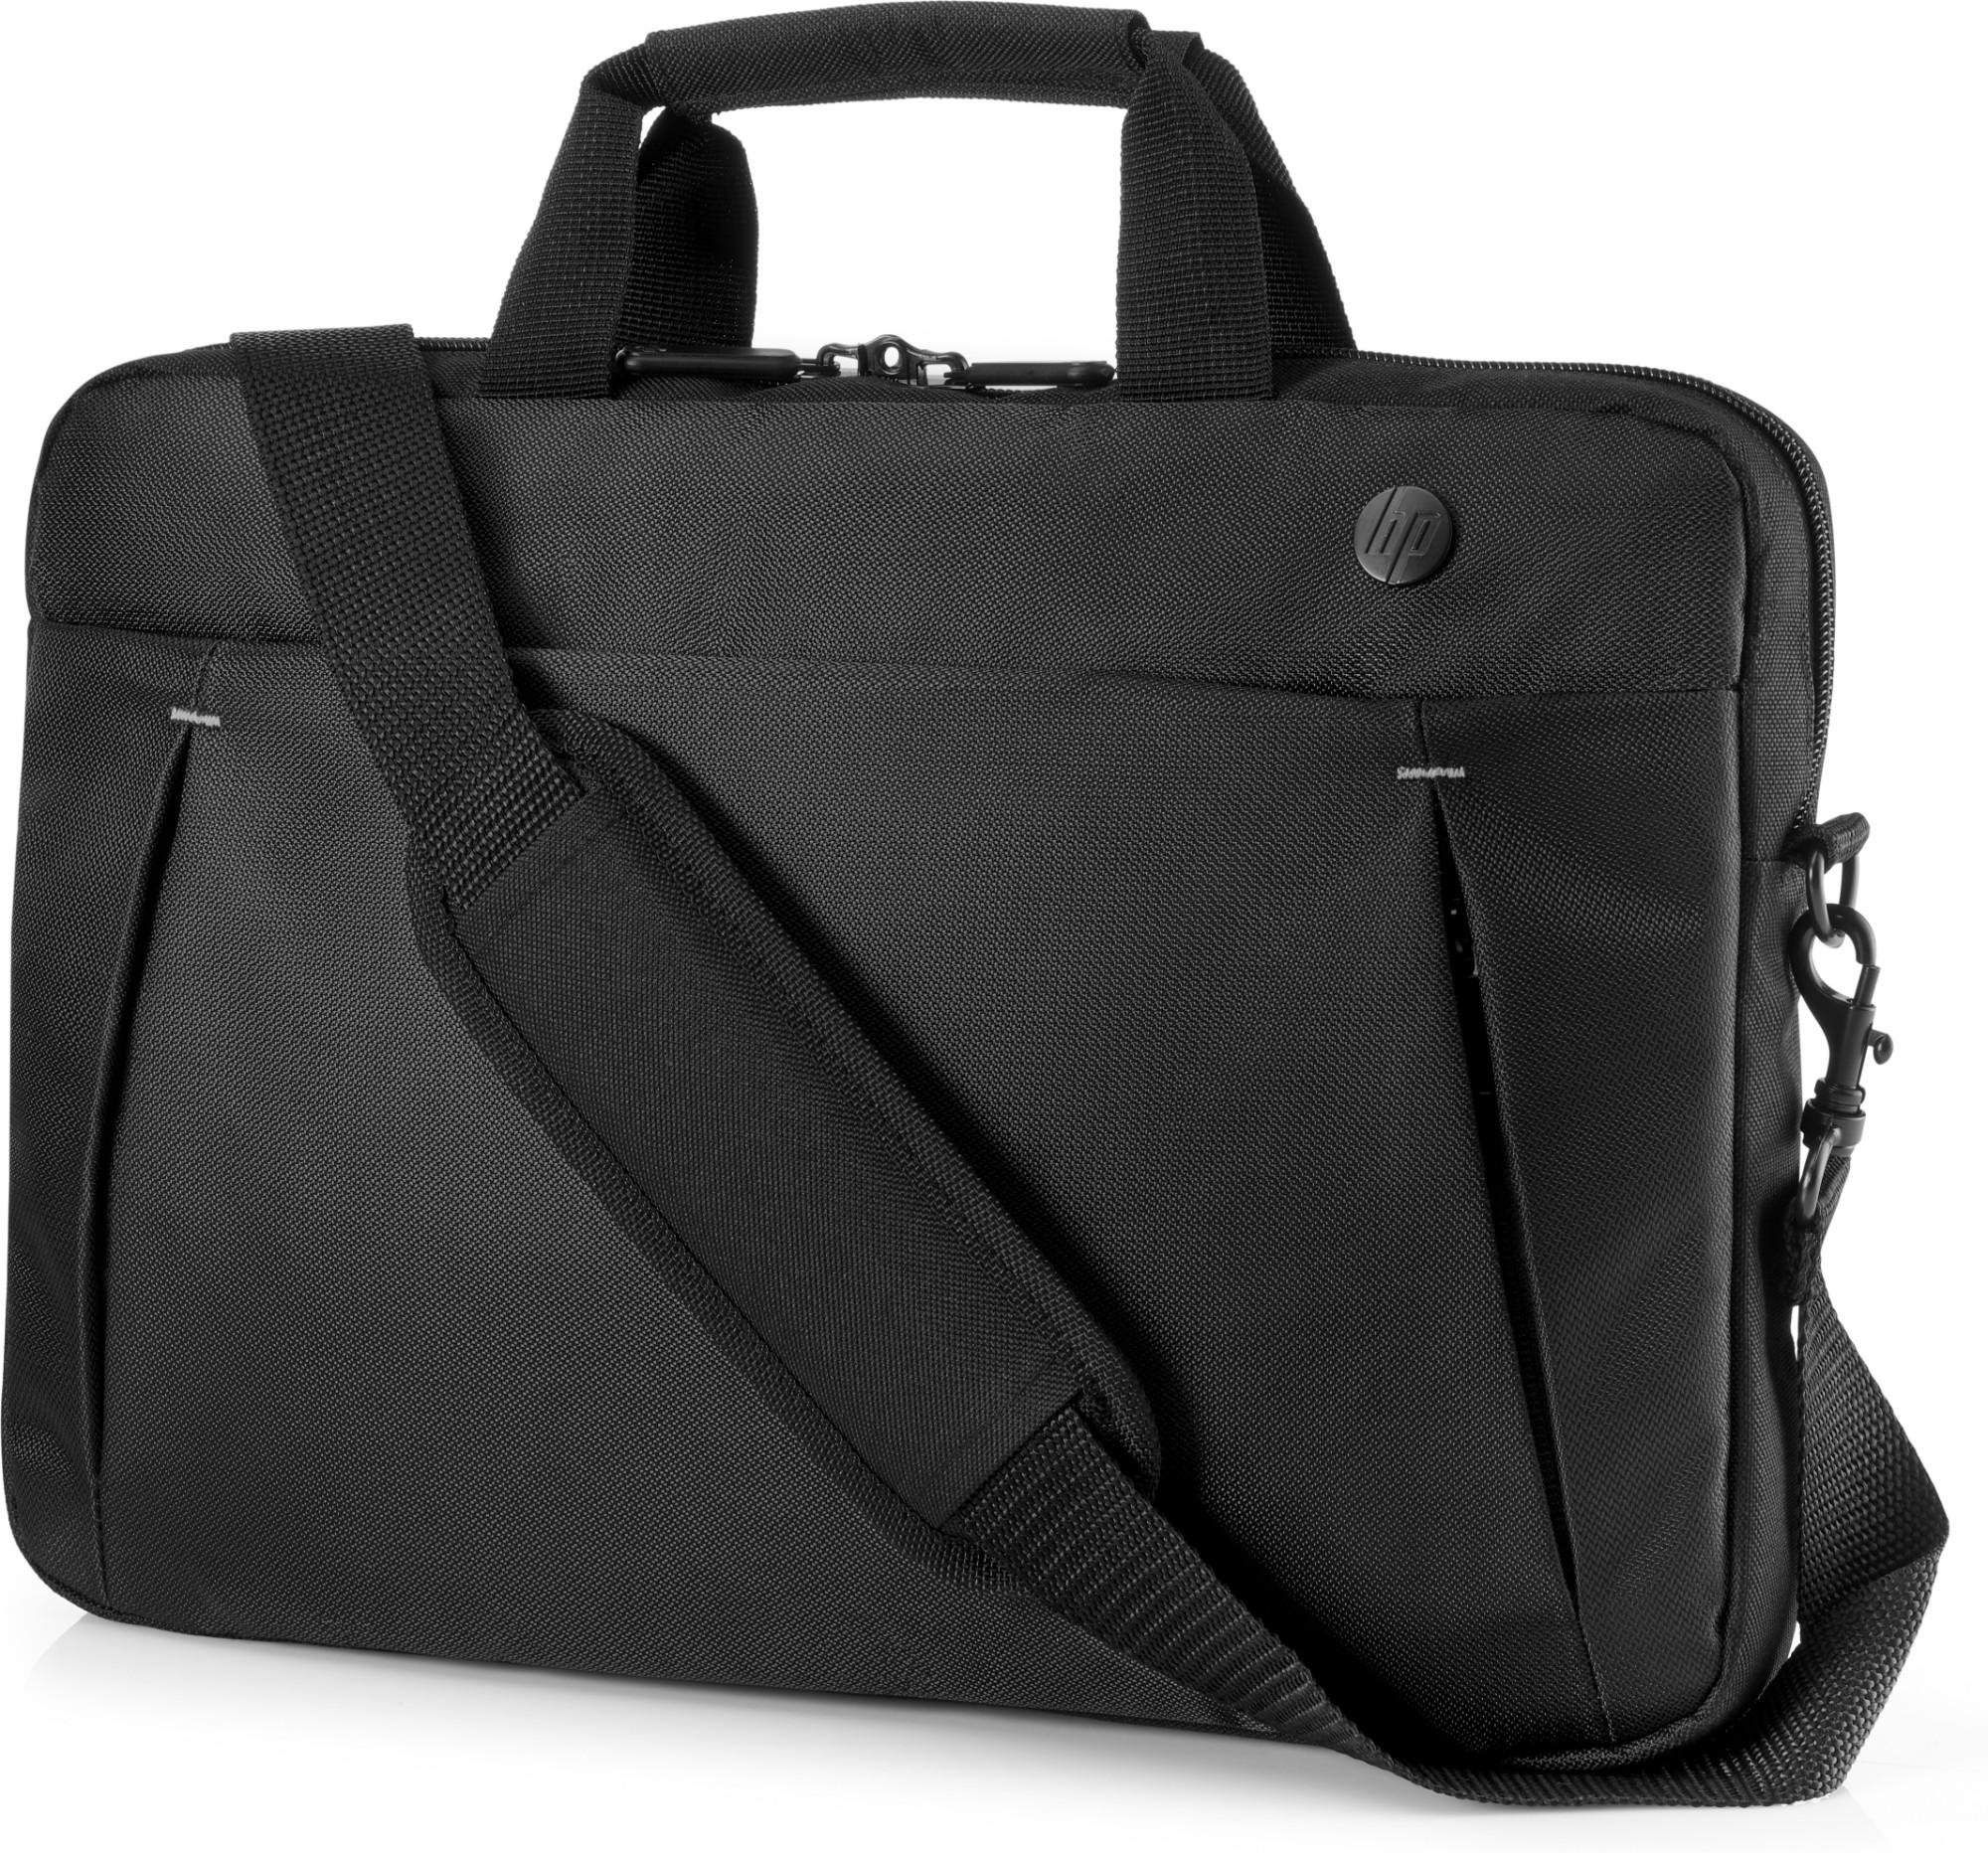 HP 14.1 Business Slim Top Load maletines para portátil